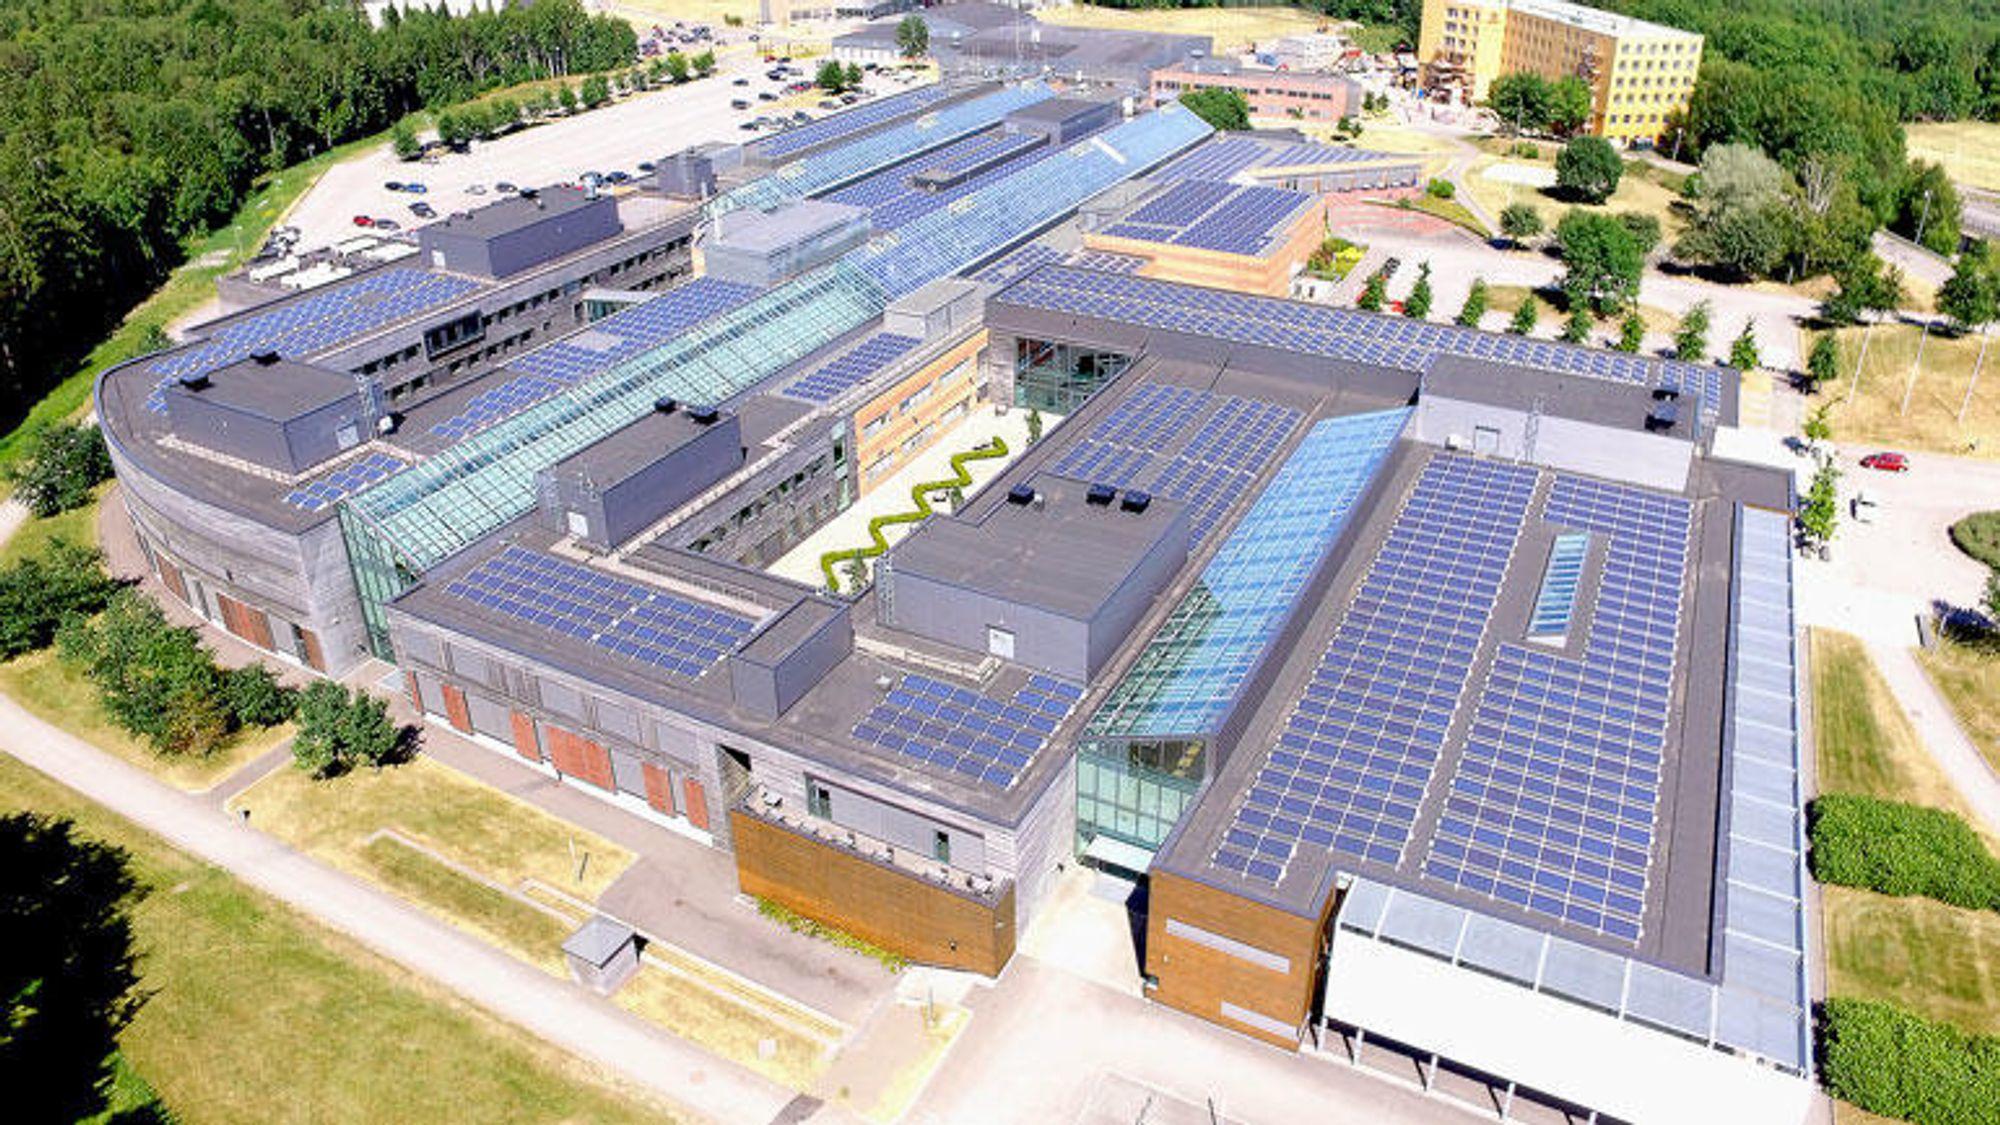 Tre tusen kvadratmeter med solcellepanel er montert på taket til USN campus Vestfold.